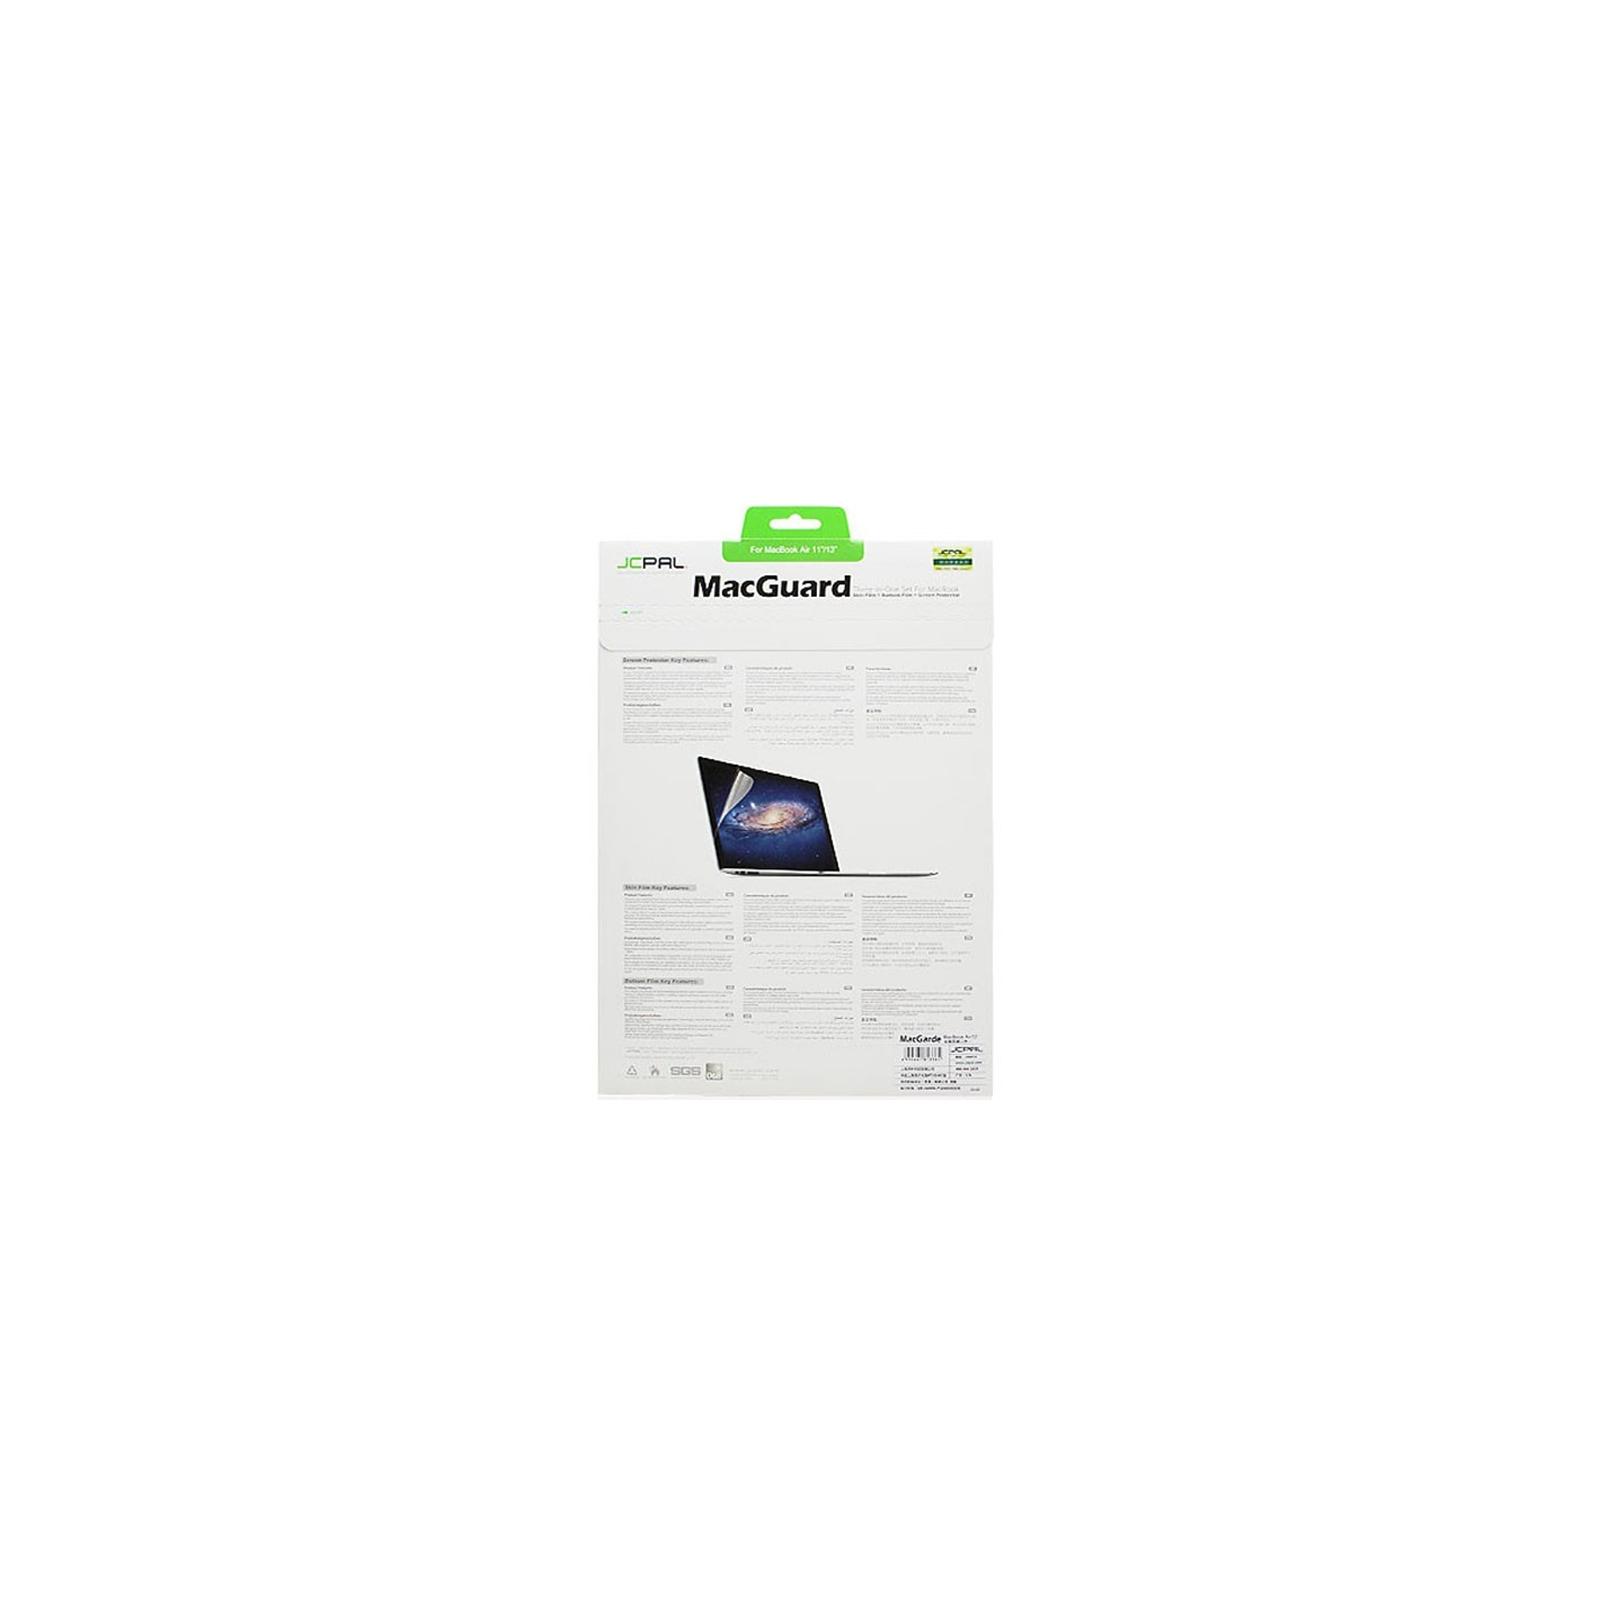 Пленка защитная JCPAL 3 in 1 set для MacBook Pro 13 (JCP2045) изображение 2